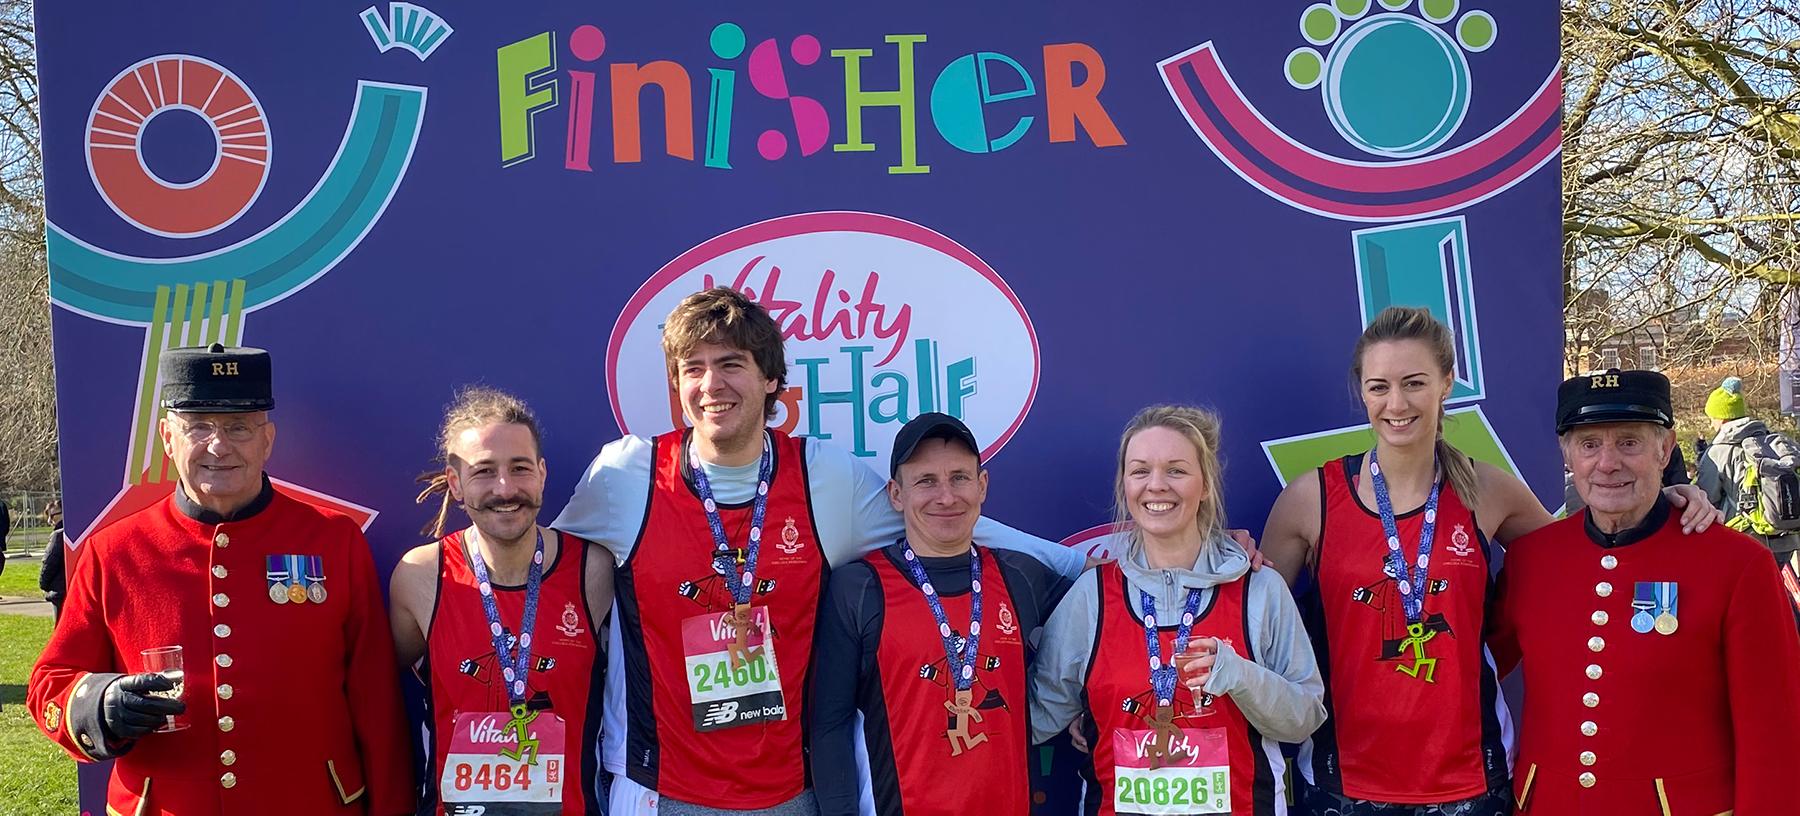 Royal Hospital Chelsea Big Half Marathon Finishers